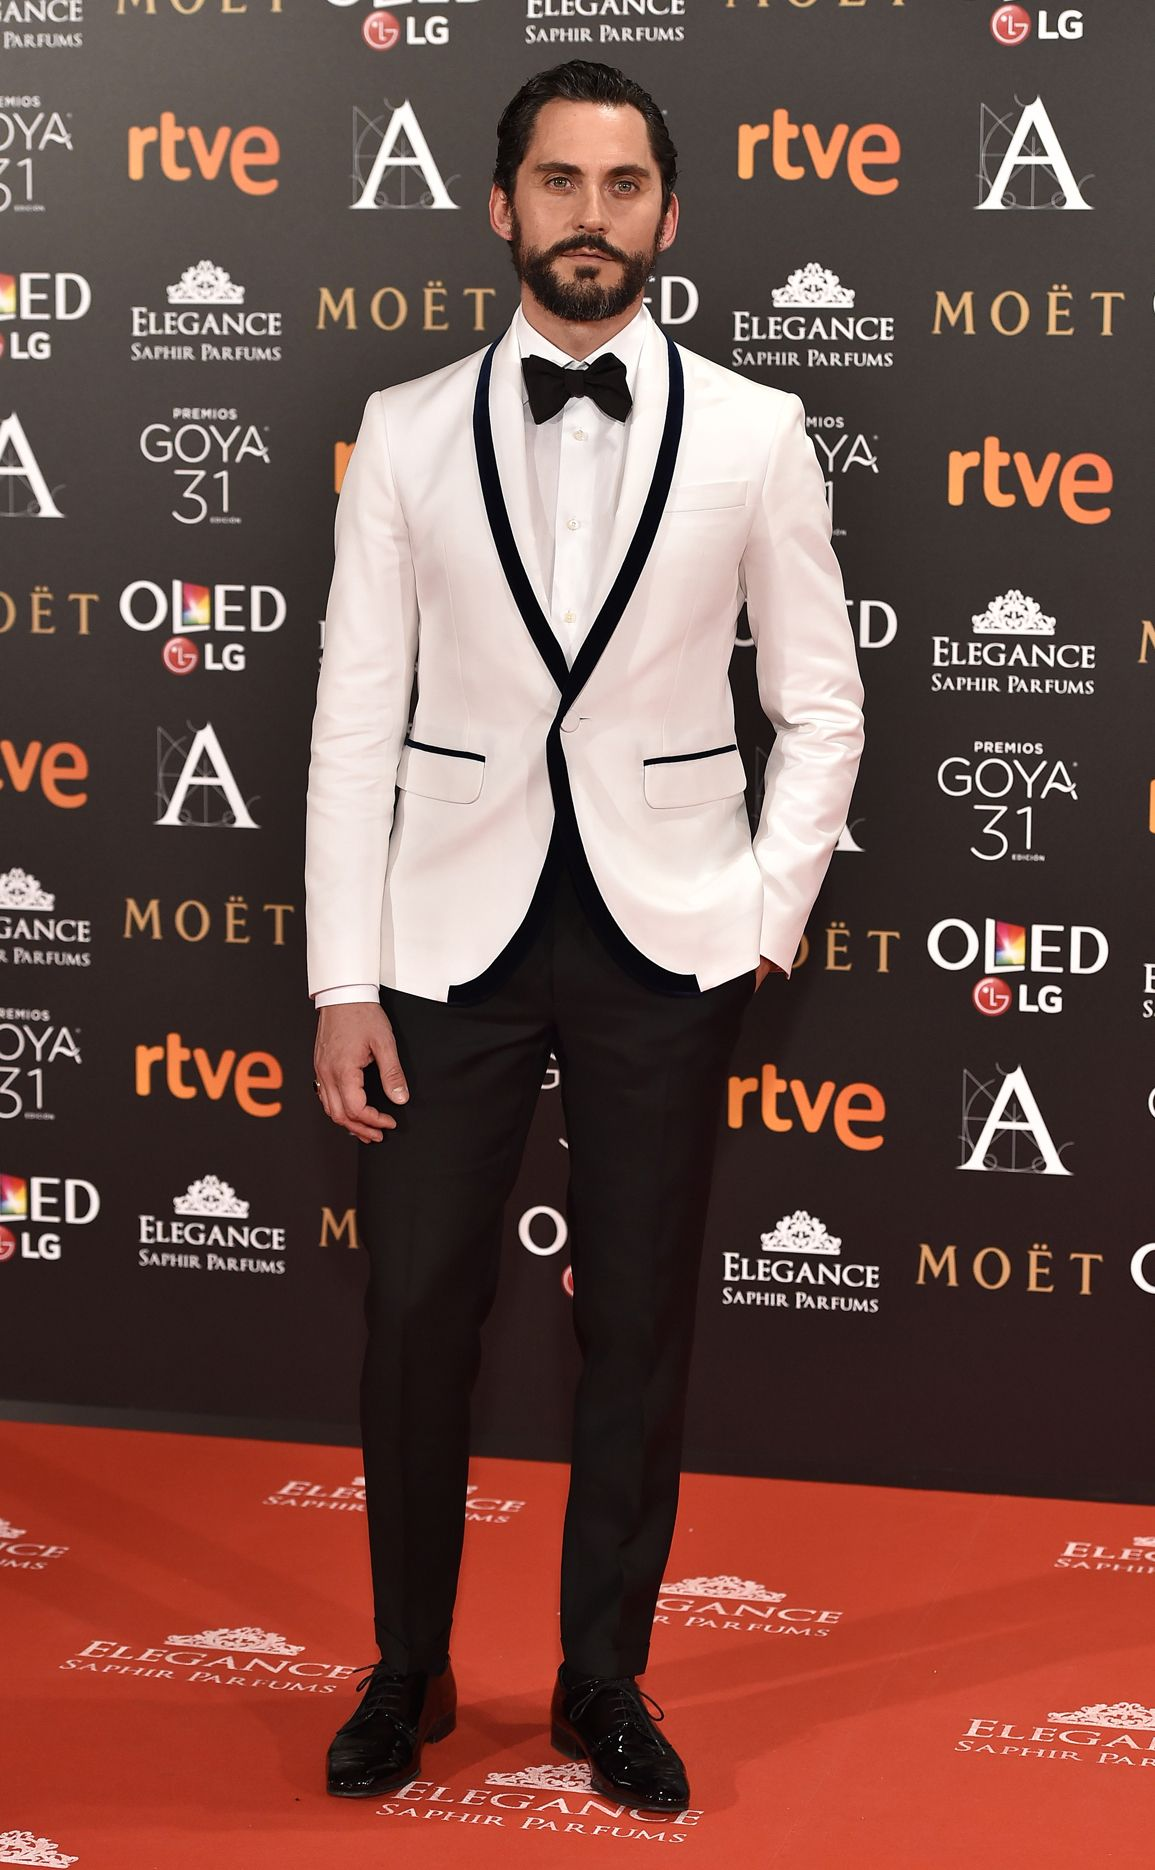 Paco León Royal Fashion 4a243e2df08